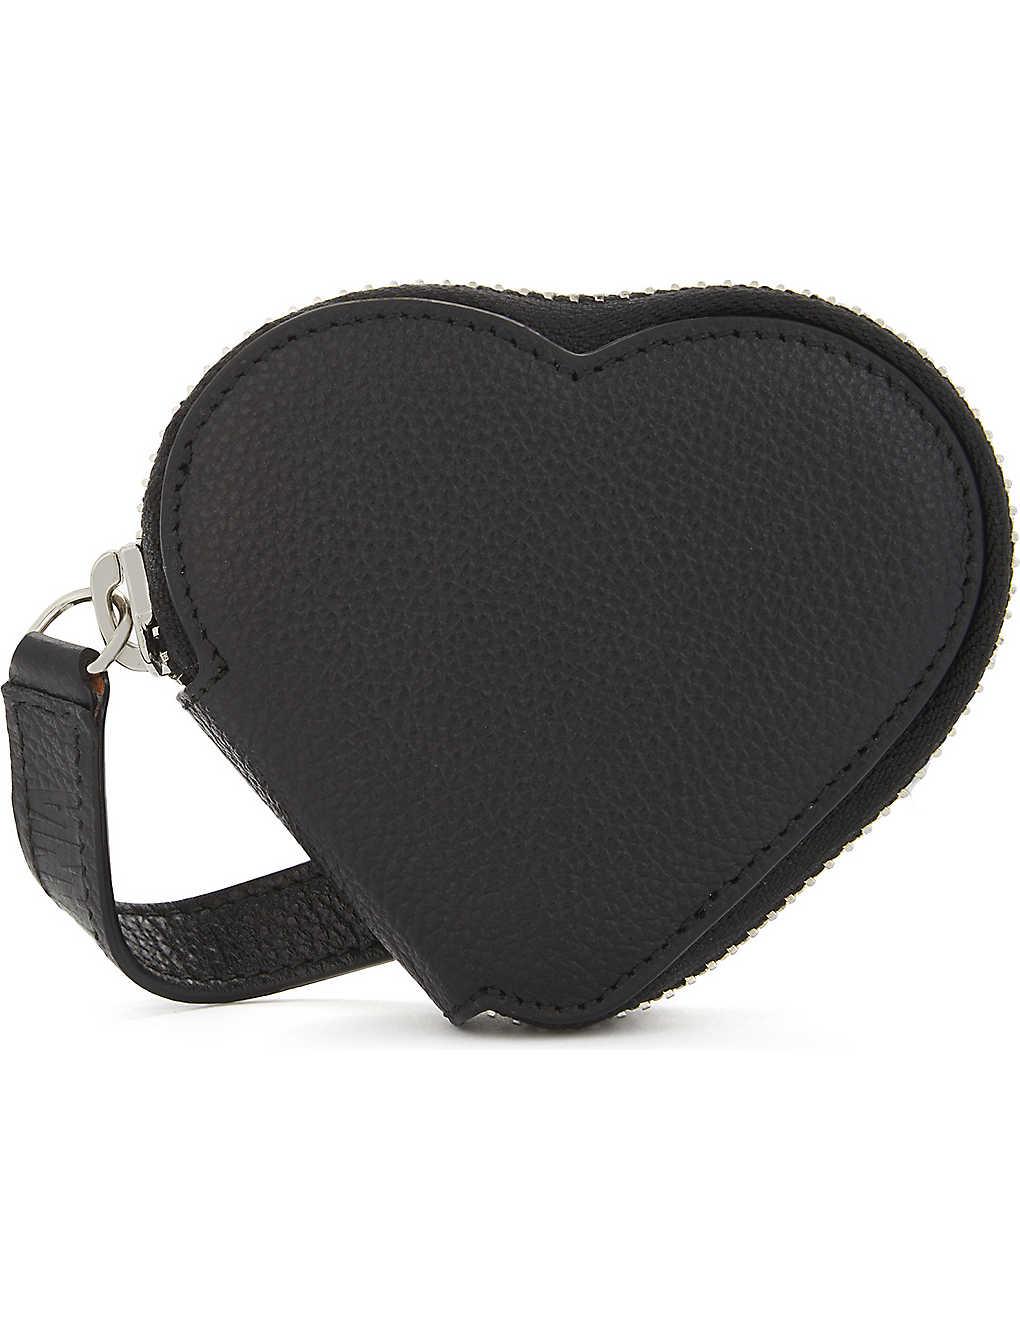 a8ecedcfd4a VIVIENNE WESTWOOD - Johanna Heart coin purse | Selfridges.com